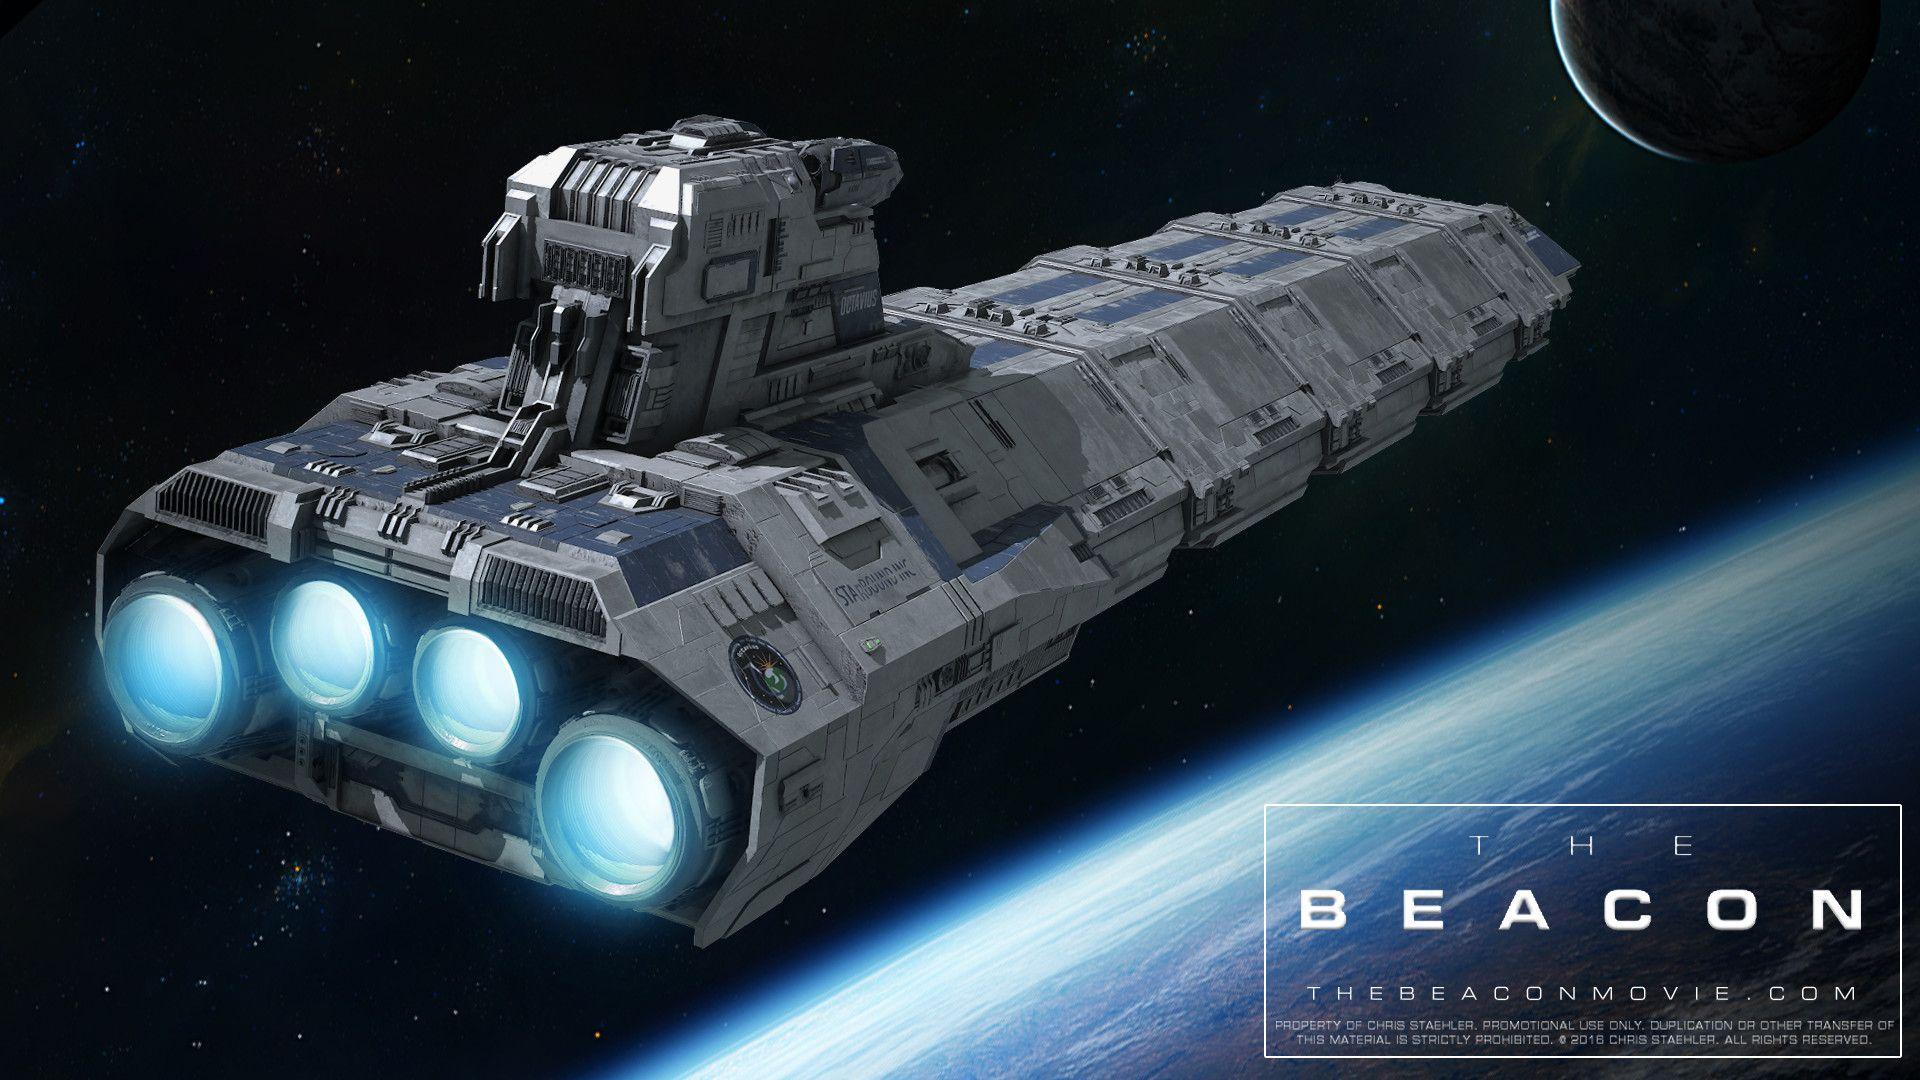 artstation the beacon cargo cruiser andrew bangel spaceship pinterest vaisseaux. Black Bedroom Furniture Sets. Home Design Ideas